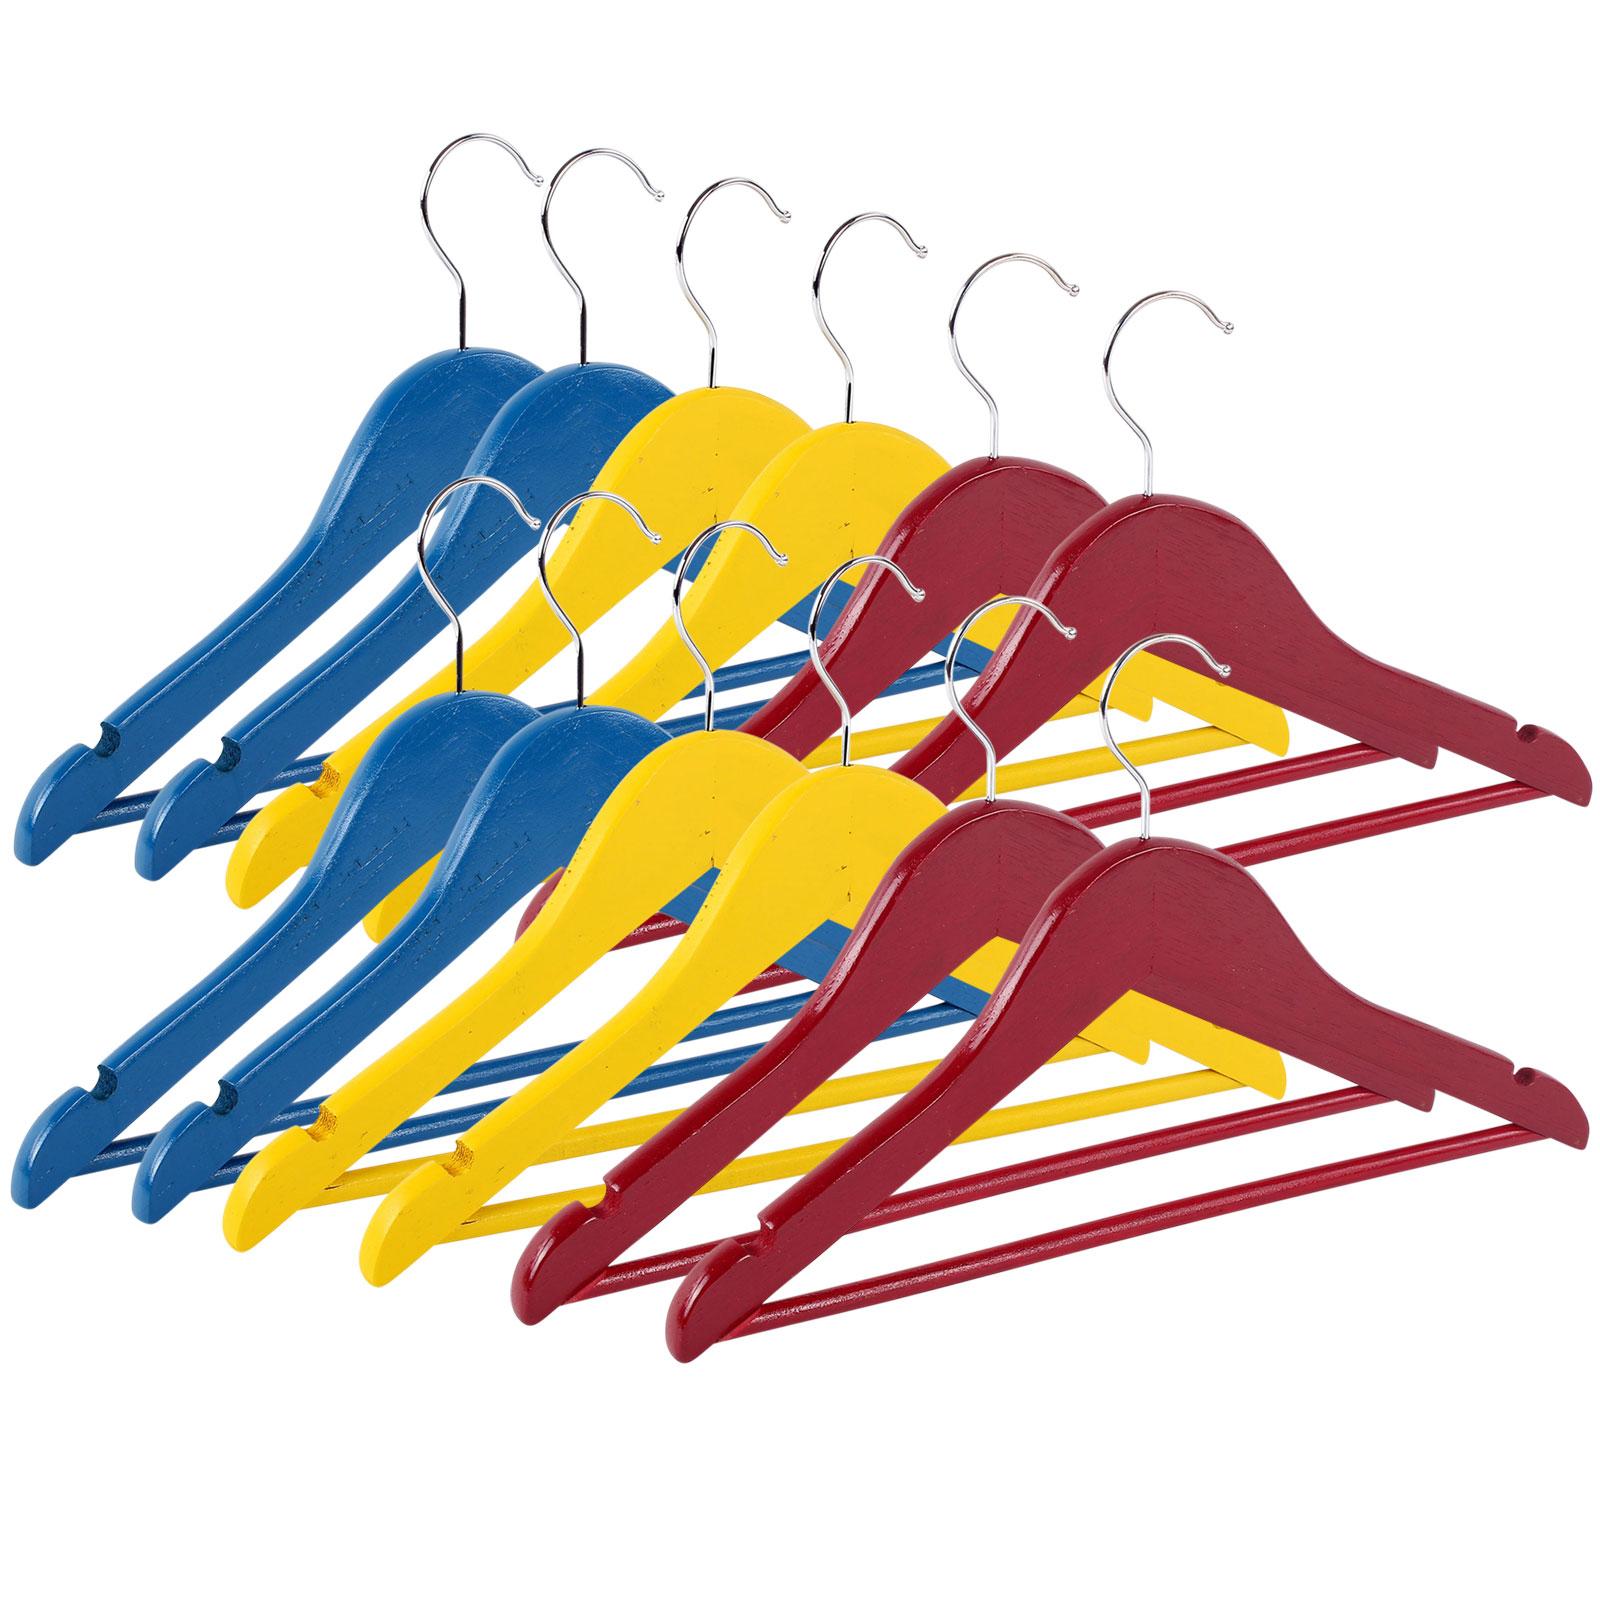 Kinderkleiderbügel aus Holz Set 12tlg, 12 bunte Farben rot/gelb/blau 35 cm